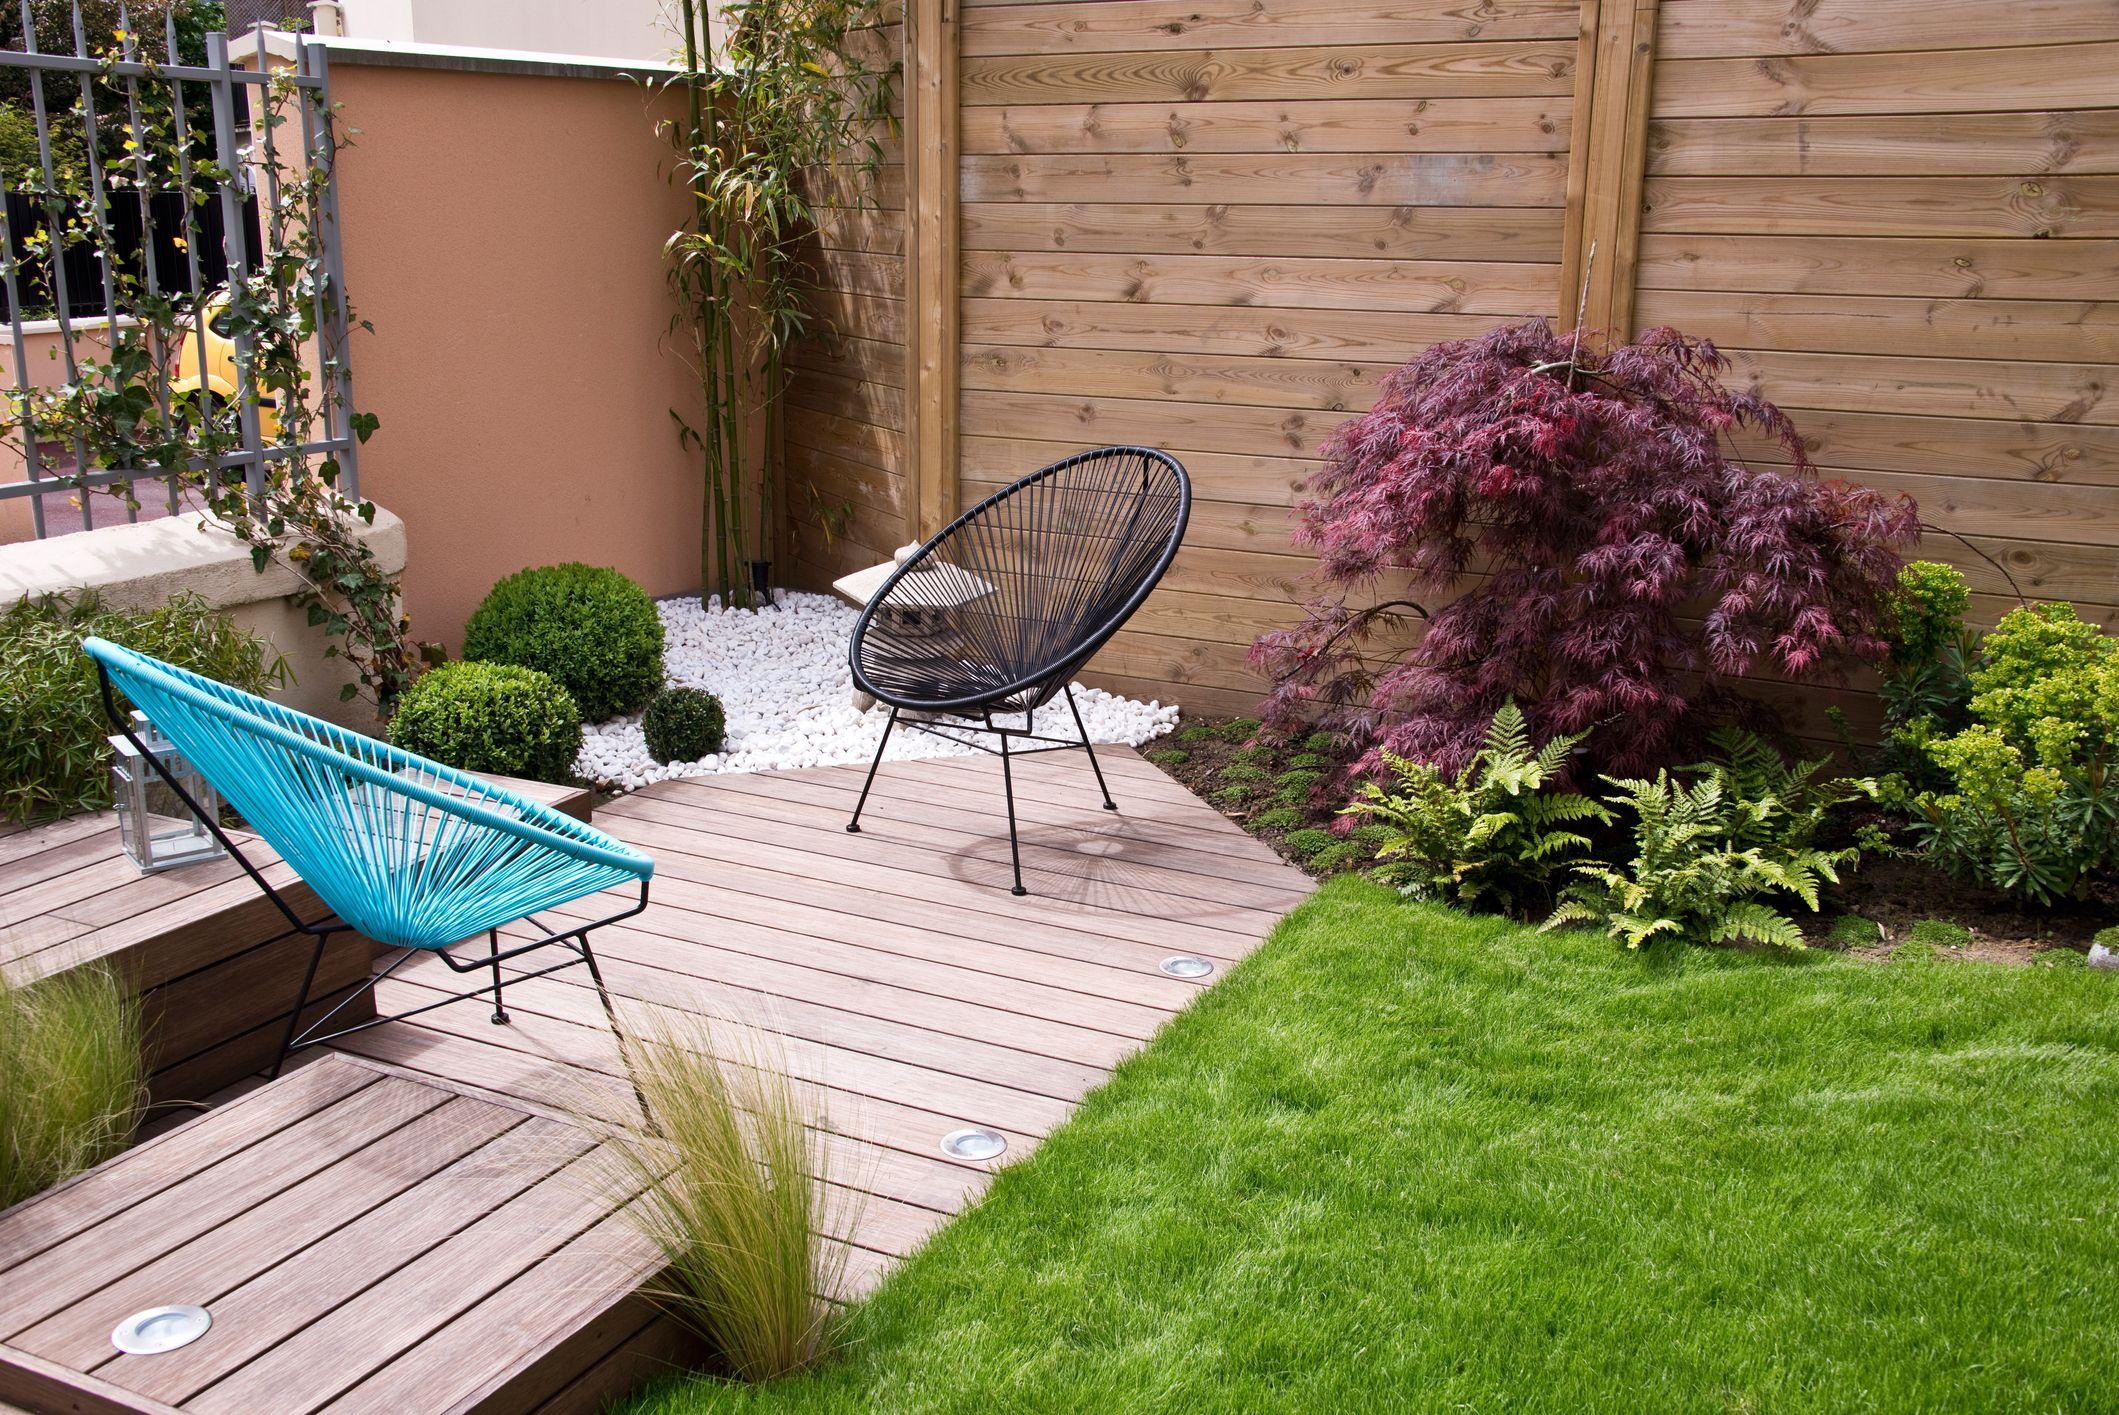 9 small garden ideas on a budget